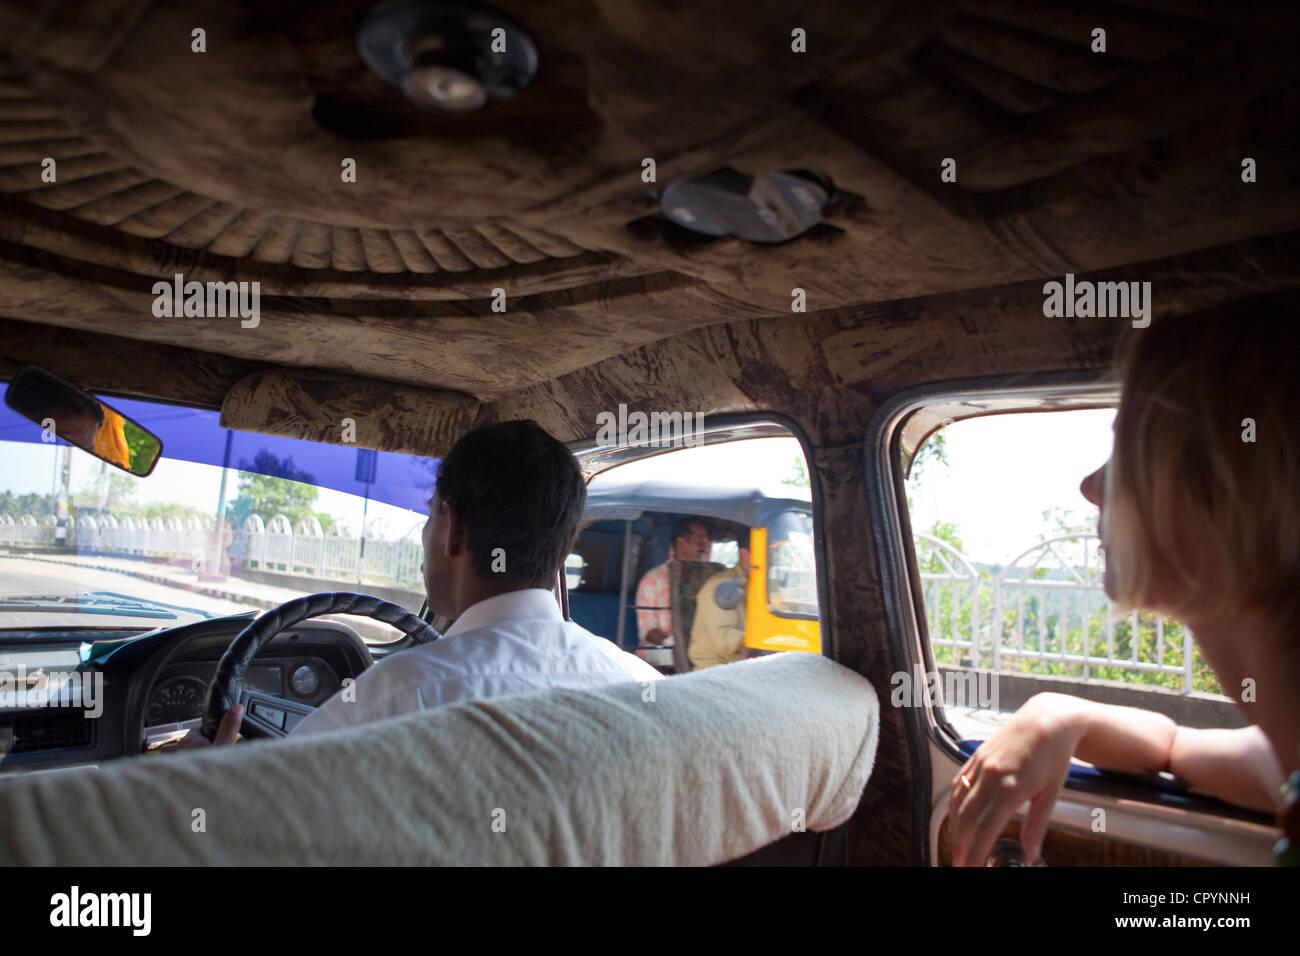 ambassador car kerala stock photos ambassador car kerala stock images alamy. Black Bedroom Furniture Sets. Home Design Ideas